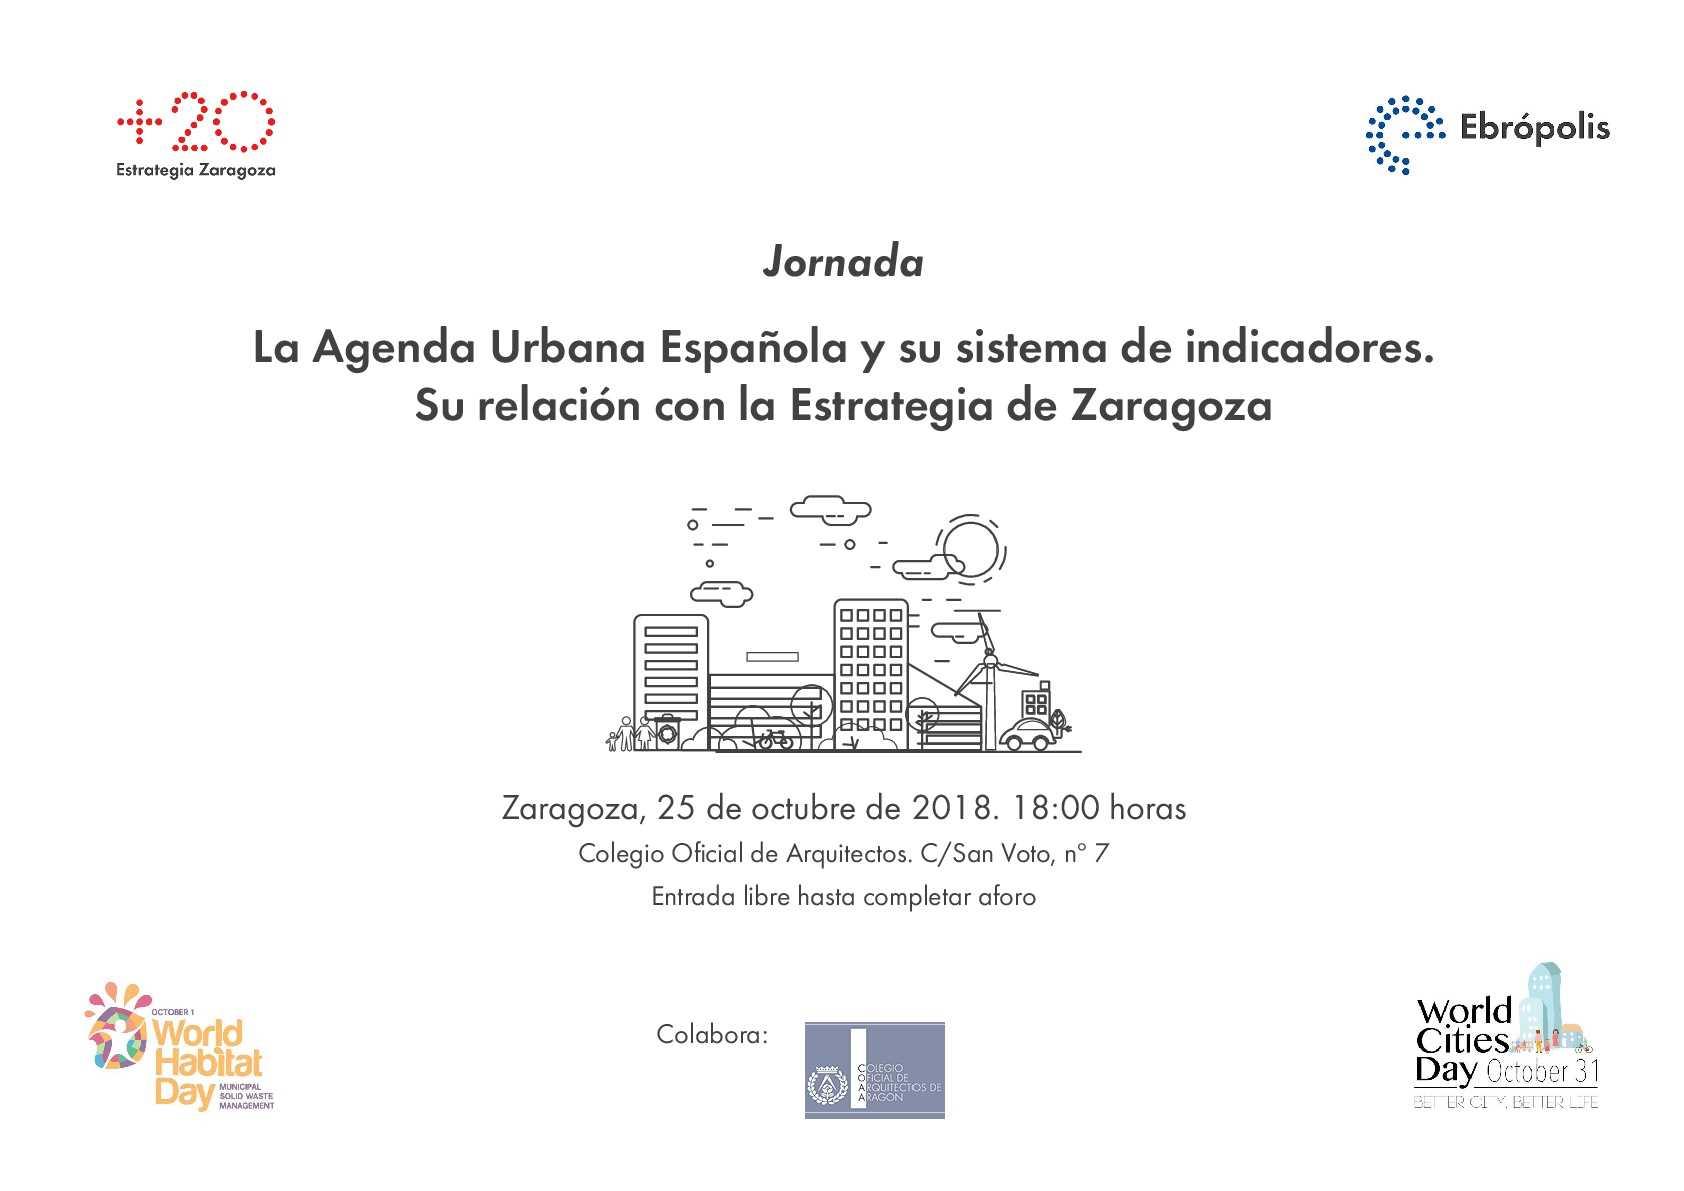 folleto-jornada-agenda-urbana-001.jpg